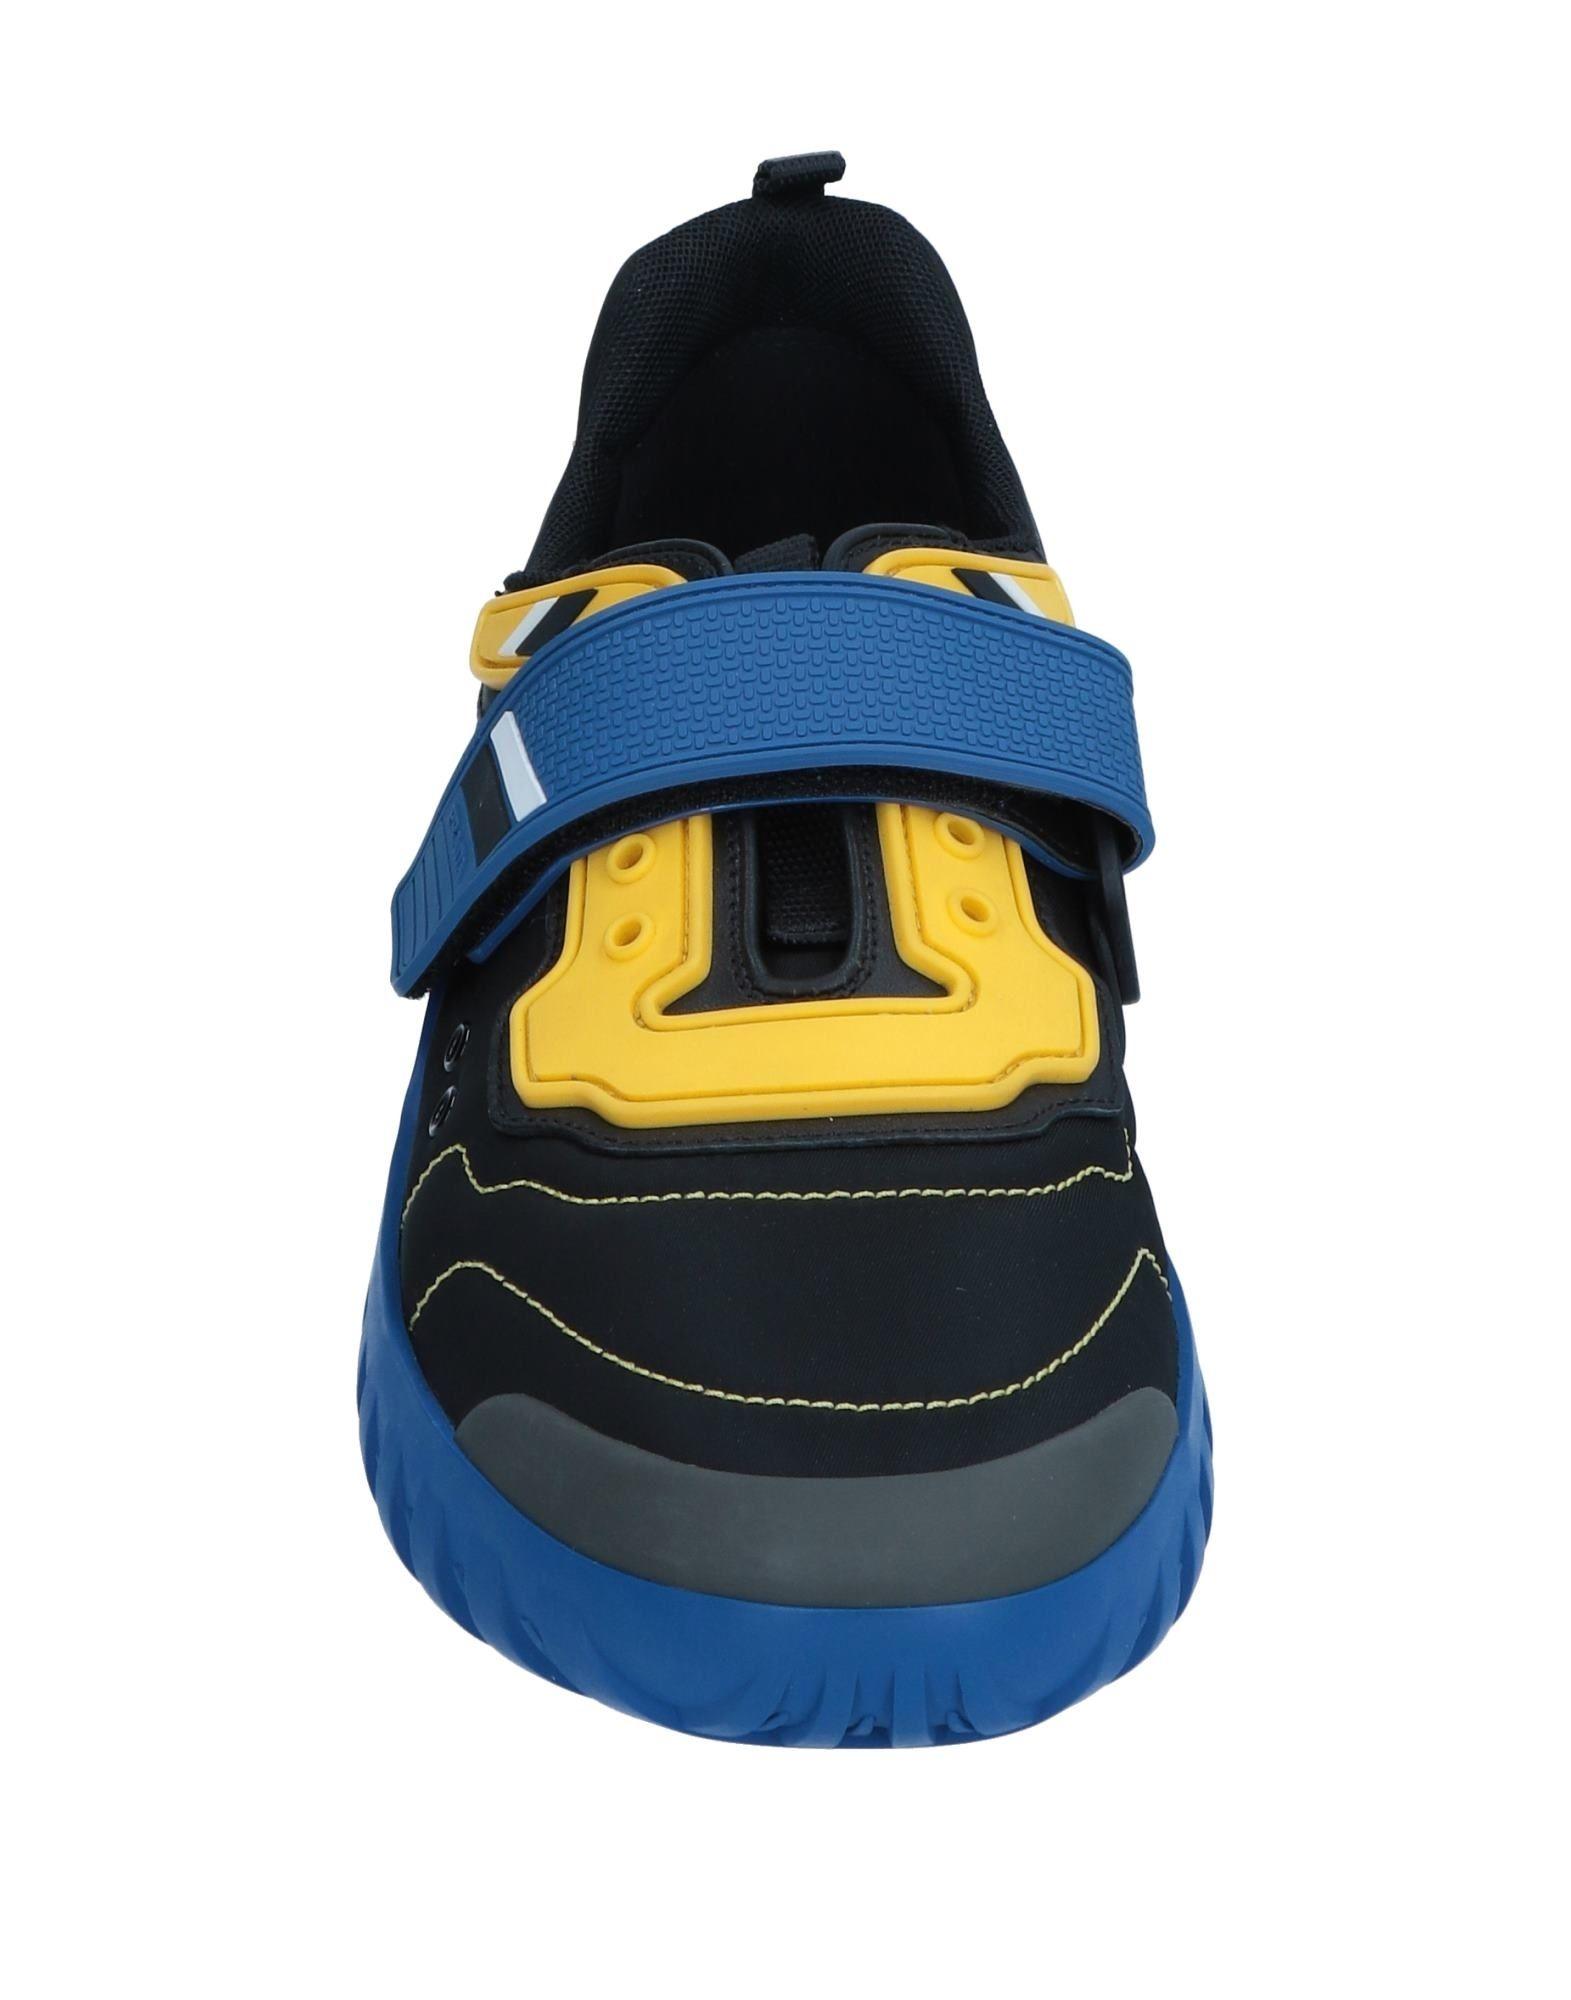 Prada Sport Sneakers Herren beliebte  11545589FR Gute Qualität beliebte Herren Schuhe 52a3be